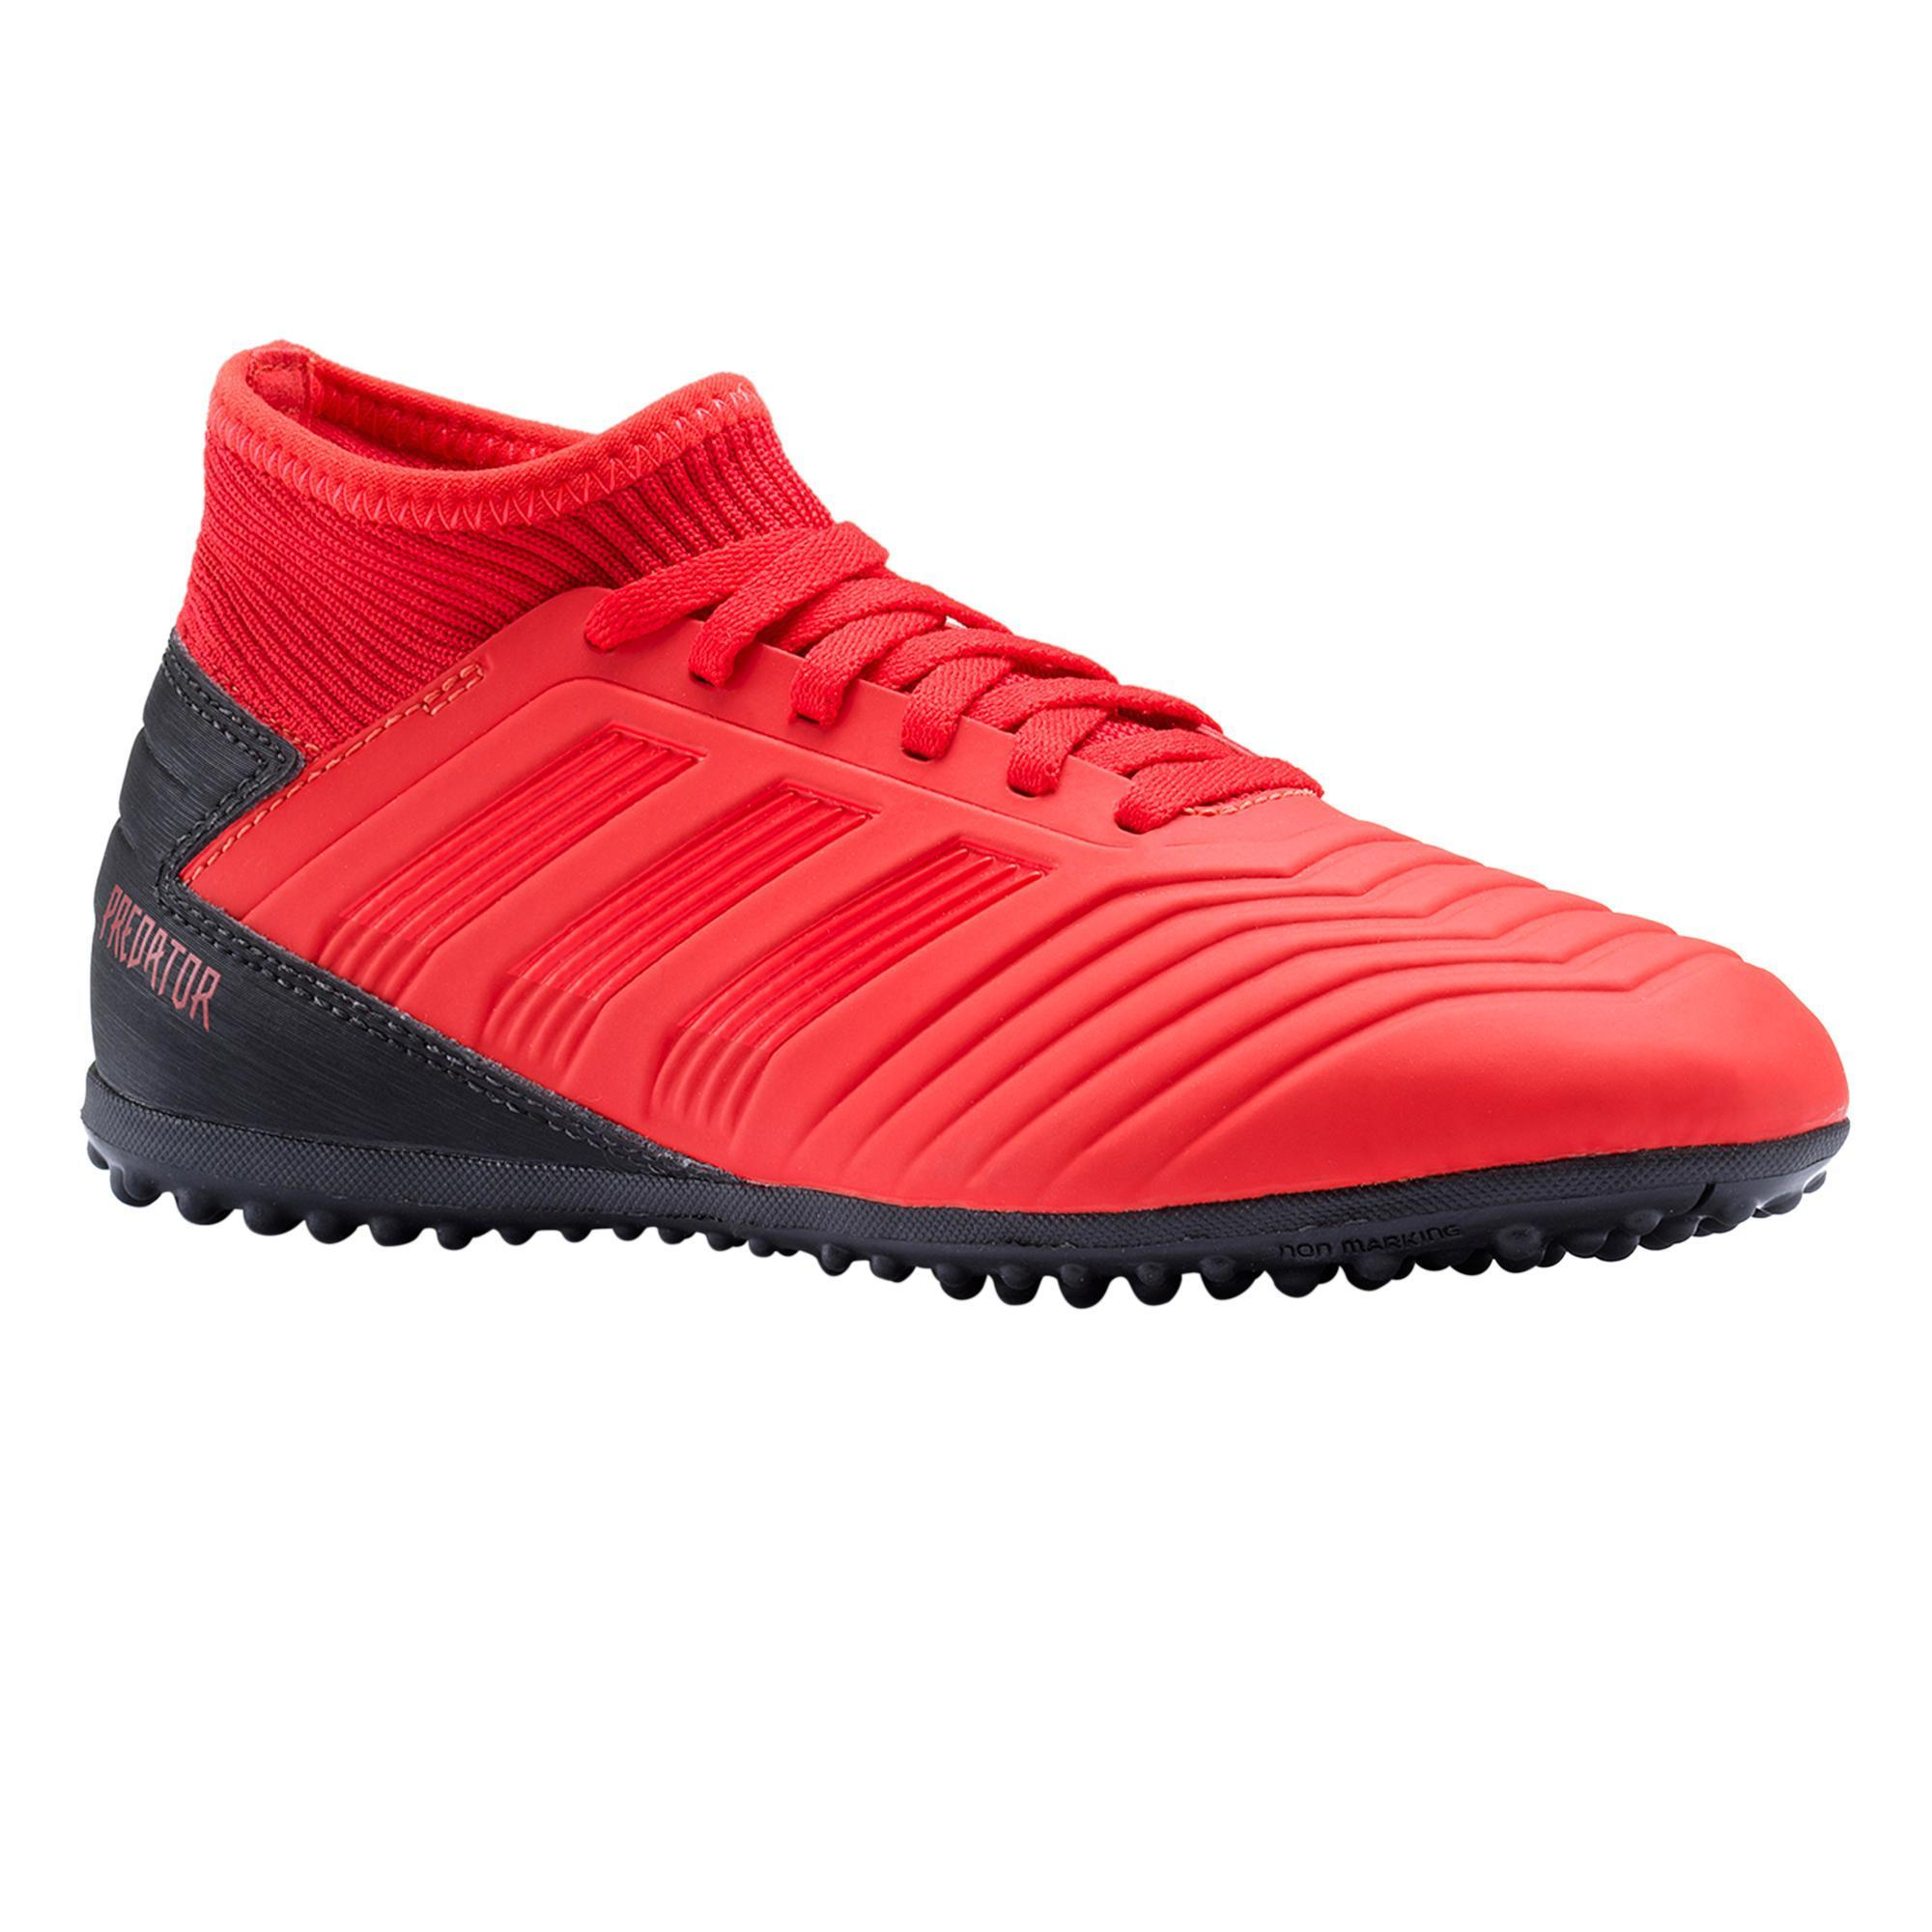 Adidas Voetbalschoenen kind Predator 19.3 TF rood